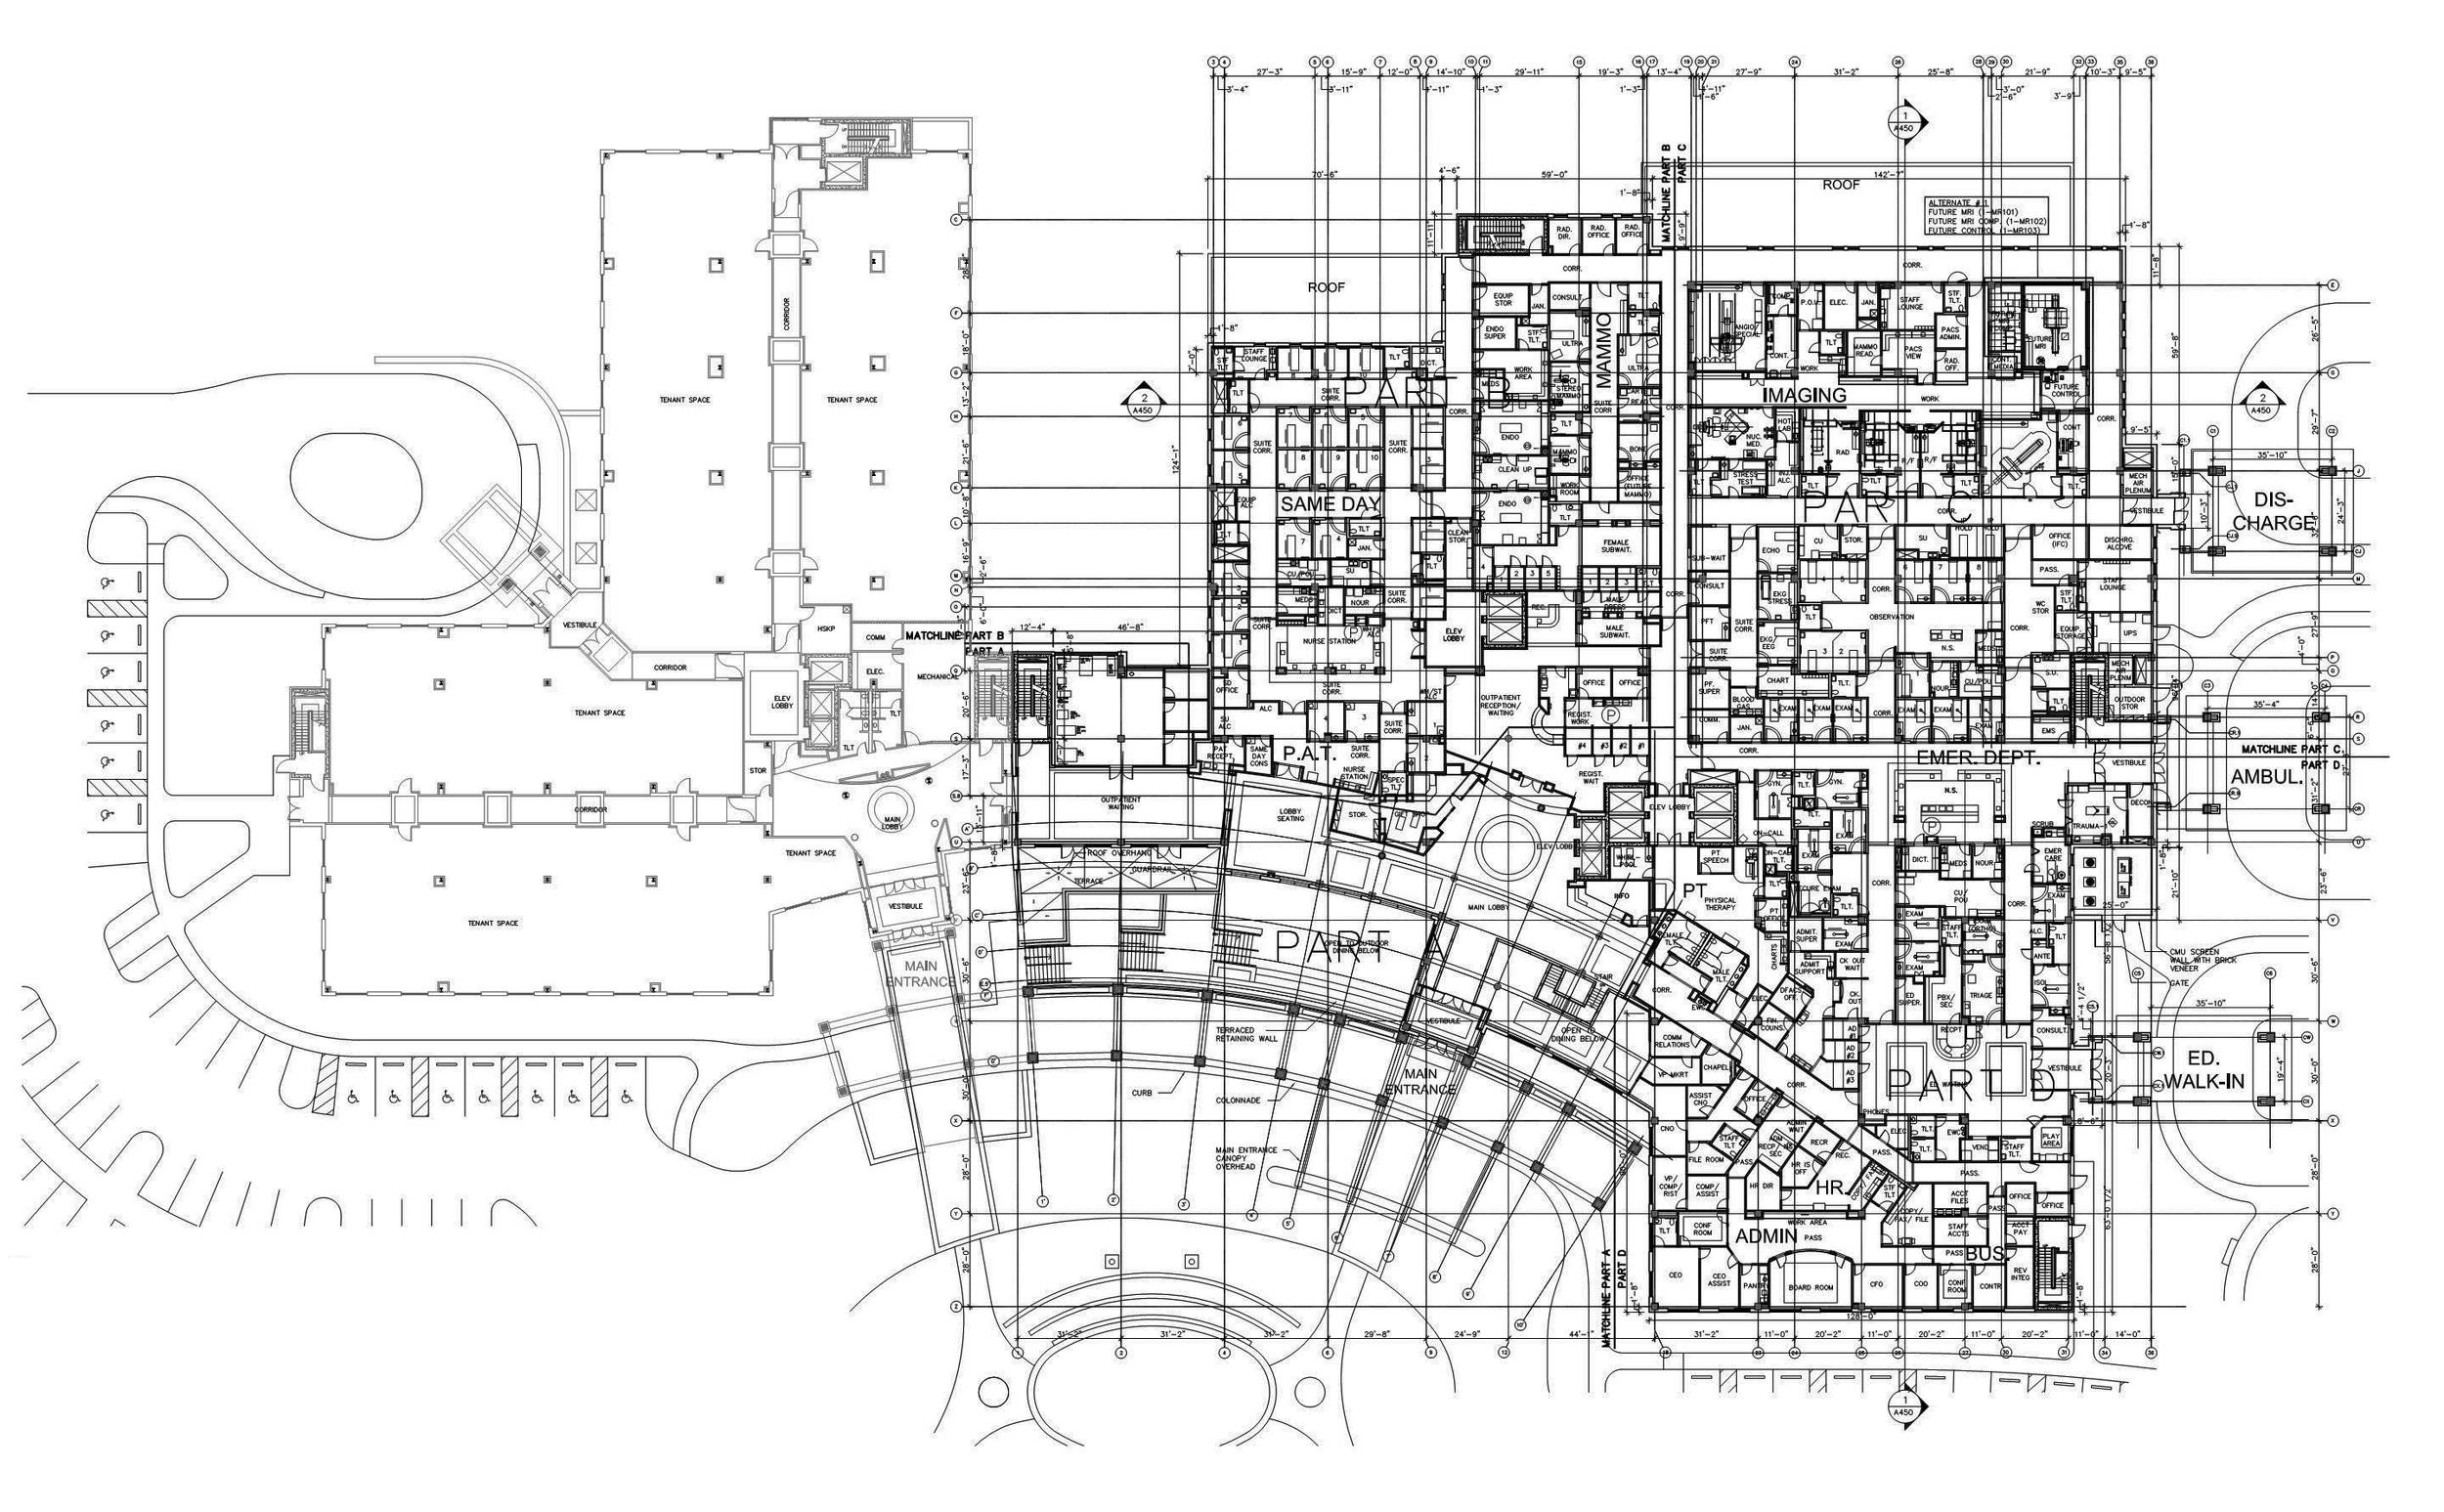 ejch floor plan.jpg